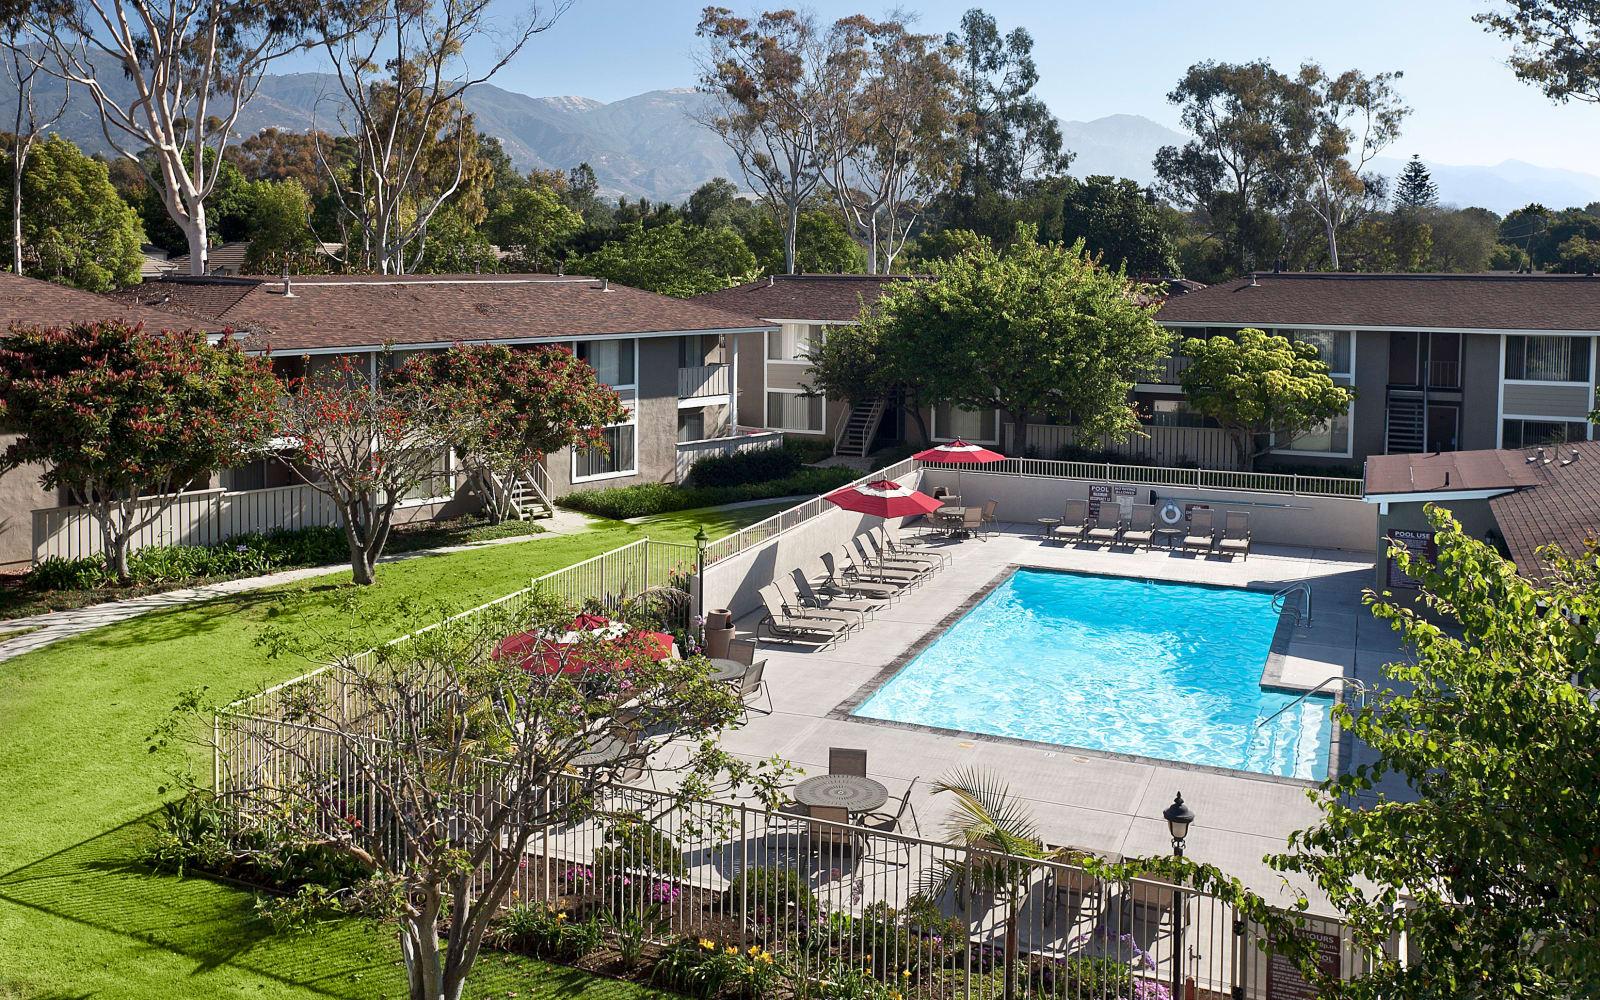 Exterior of Patterson Place Apartments in Santa Barbara